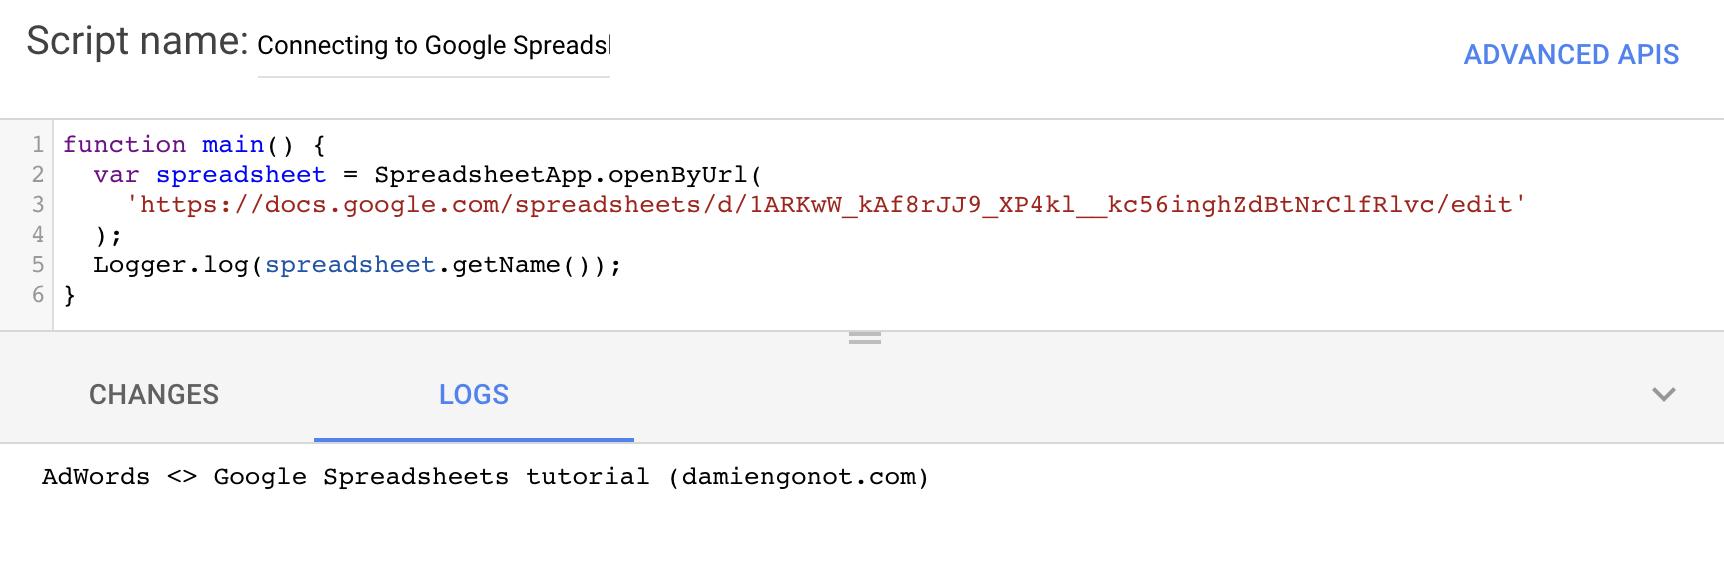 Spreadsheet name log